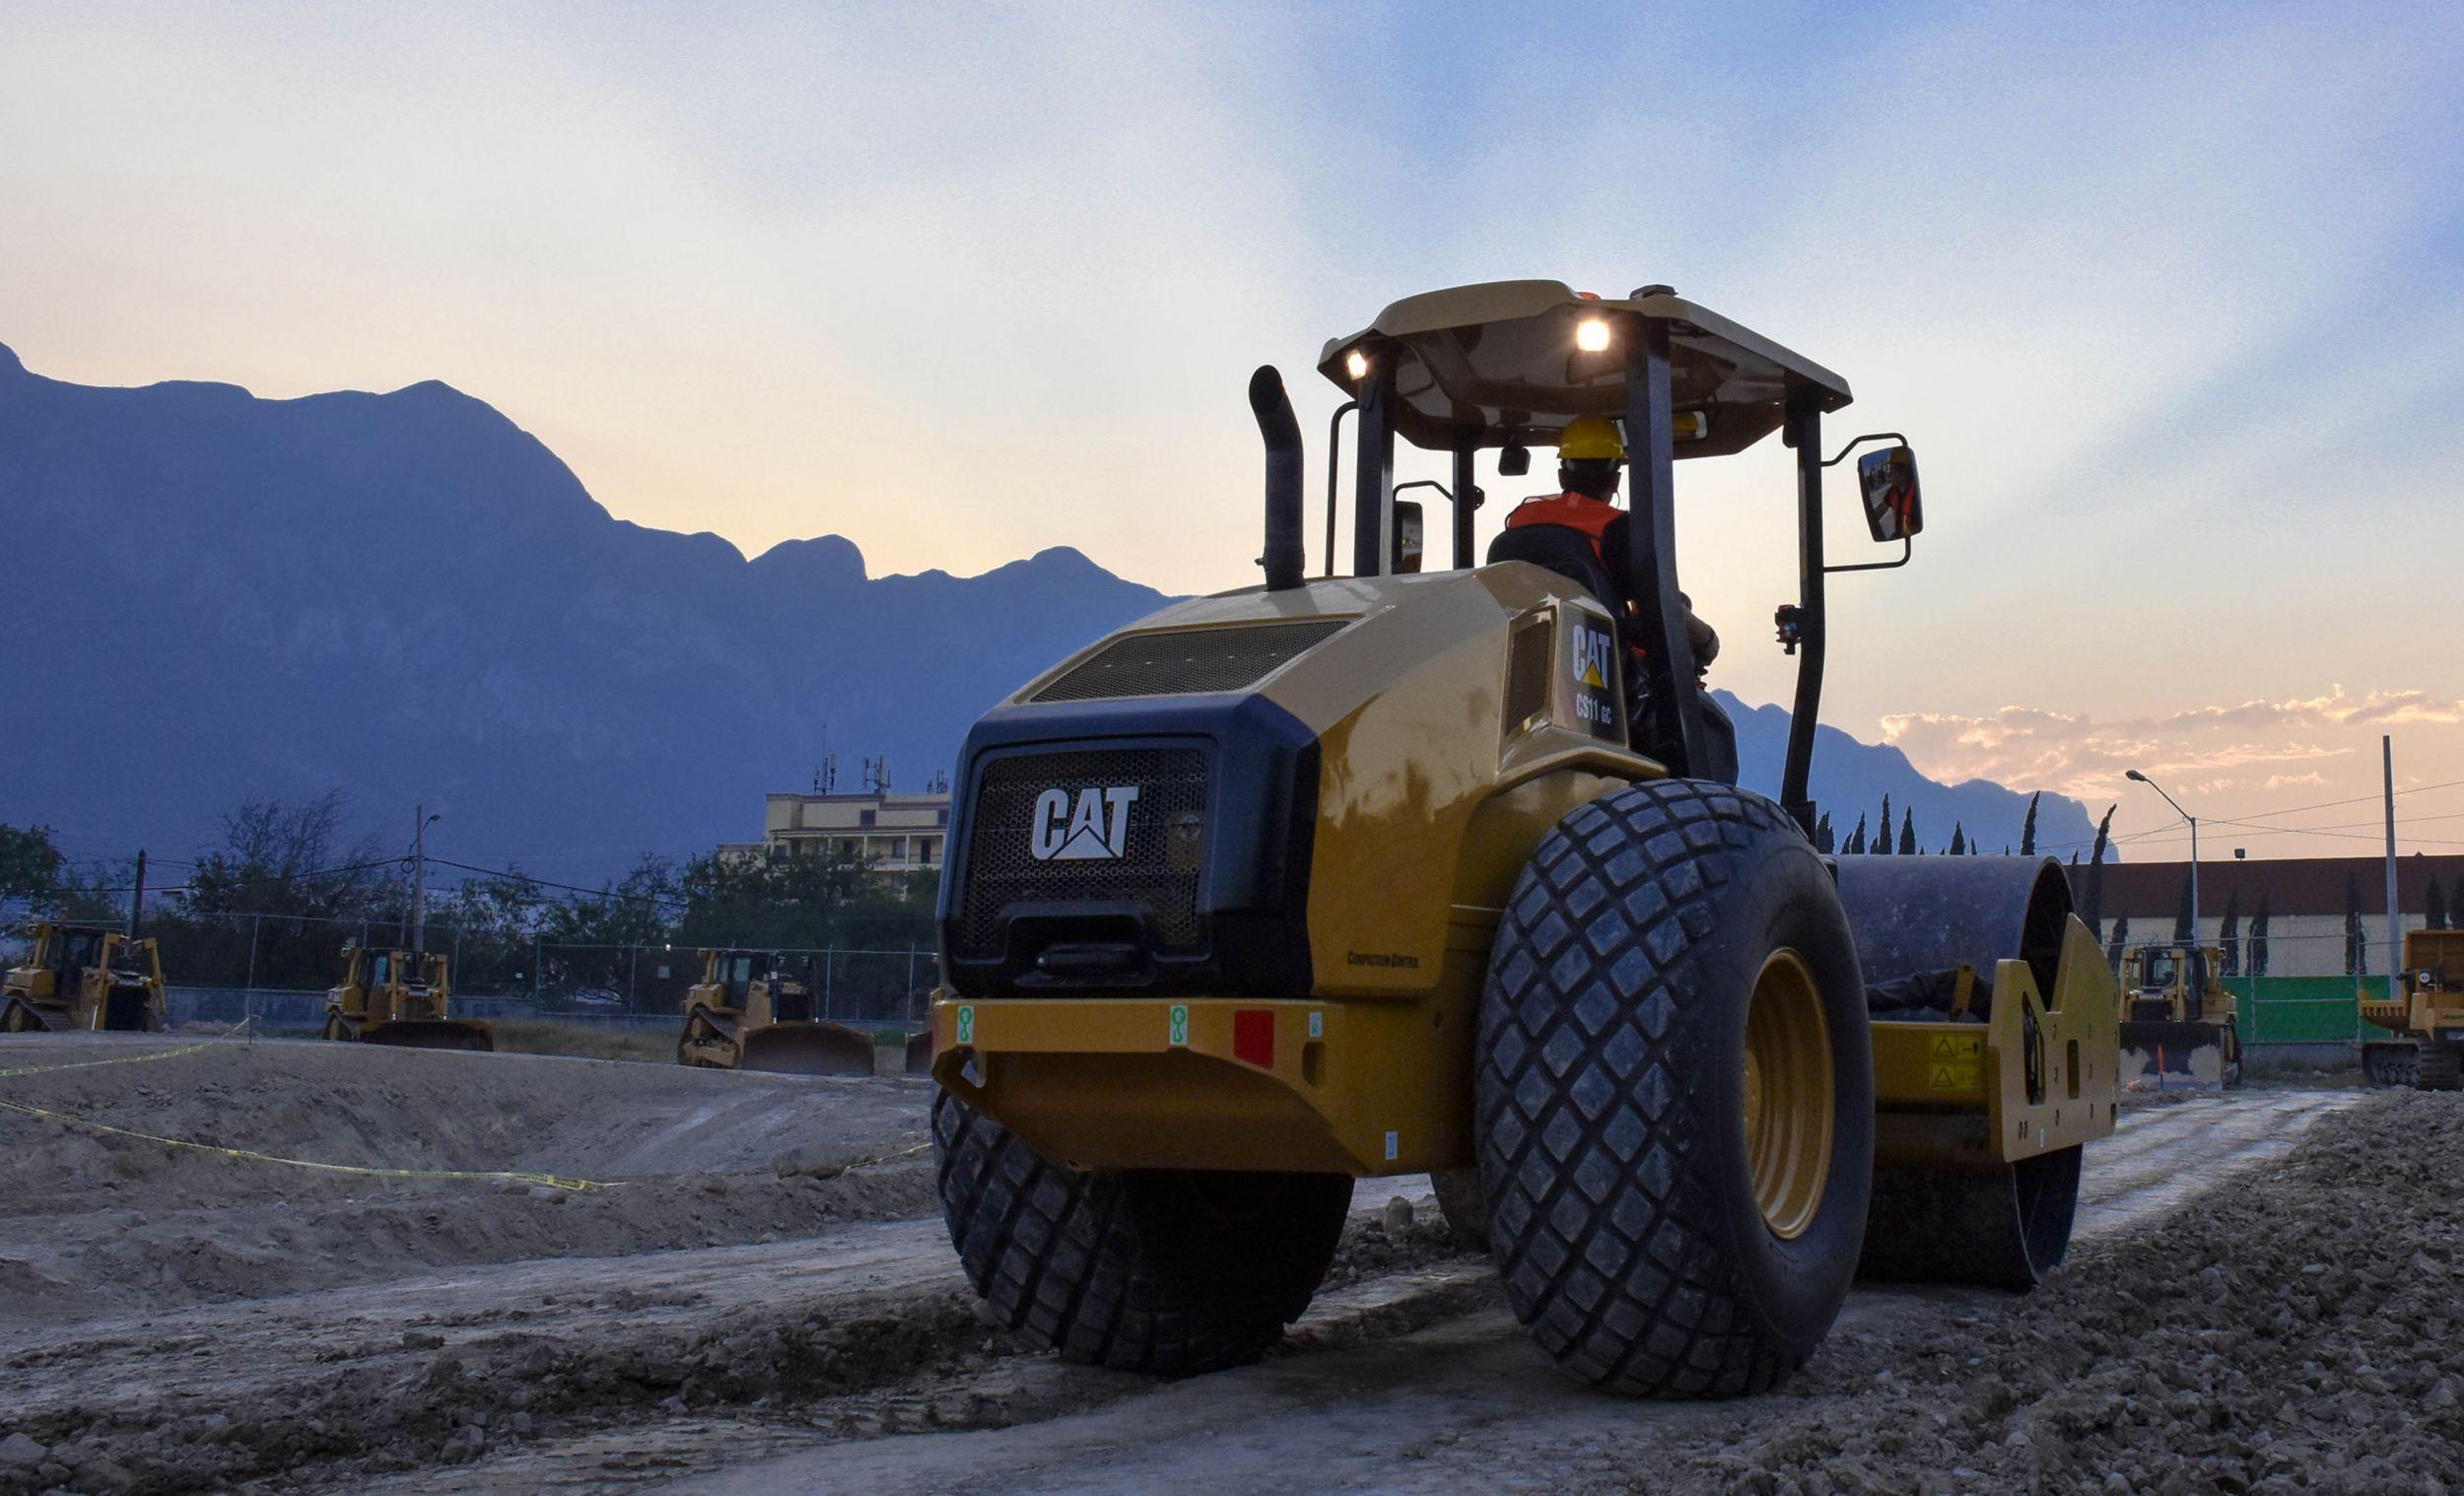 Get Special Interest Rates on New Cat® Vibratory Soil Compactors